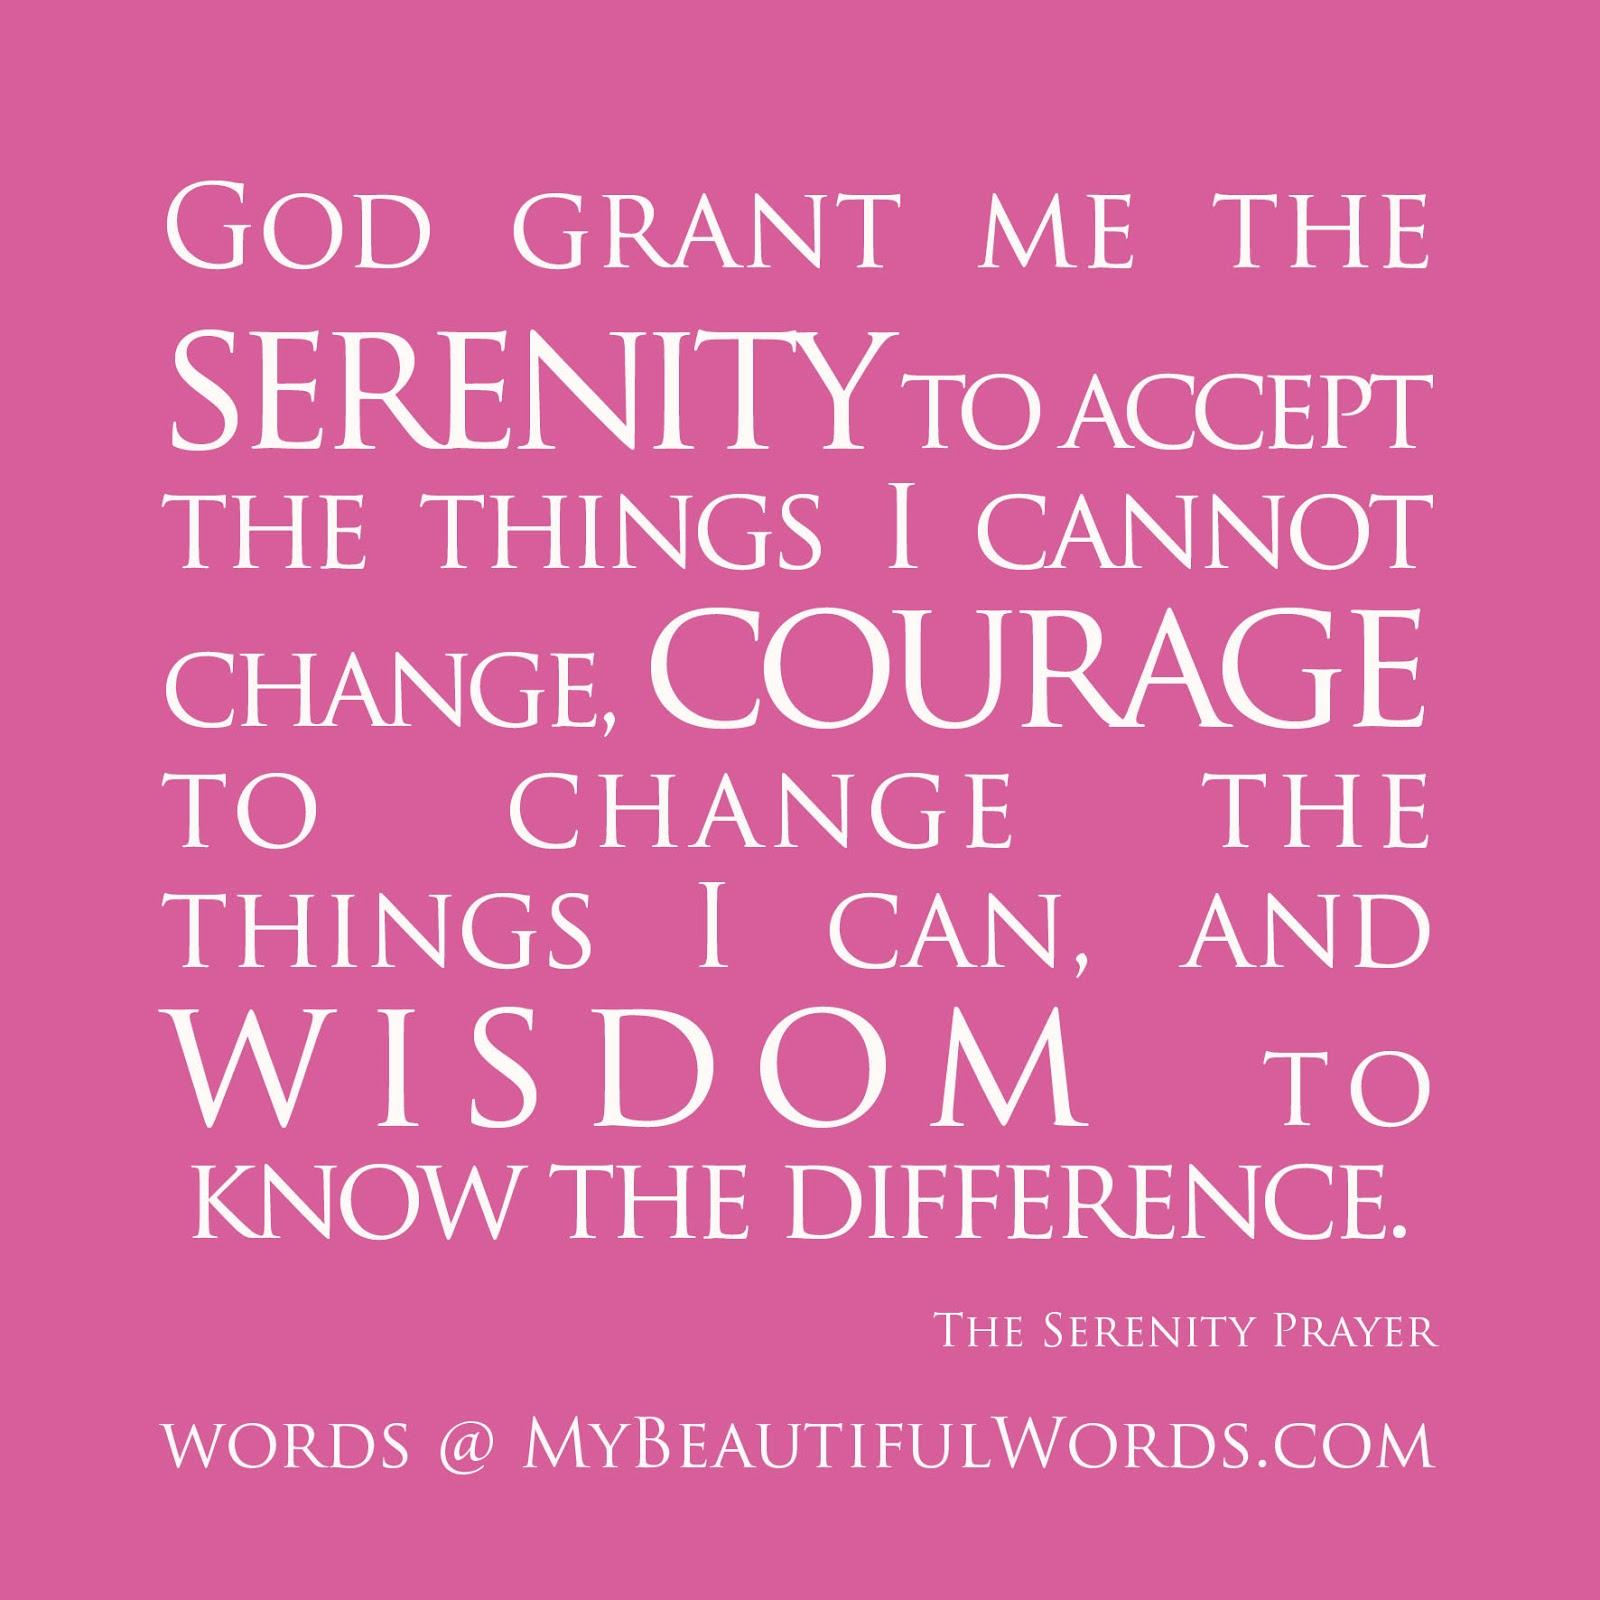 My Beautiful Words.: The Serenity Prayer...